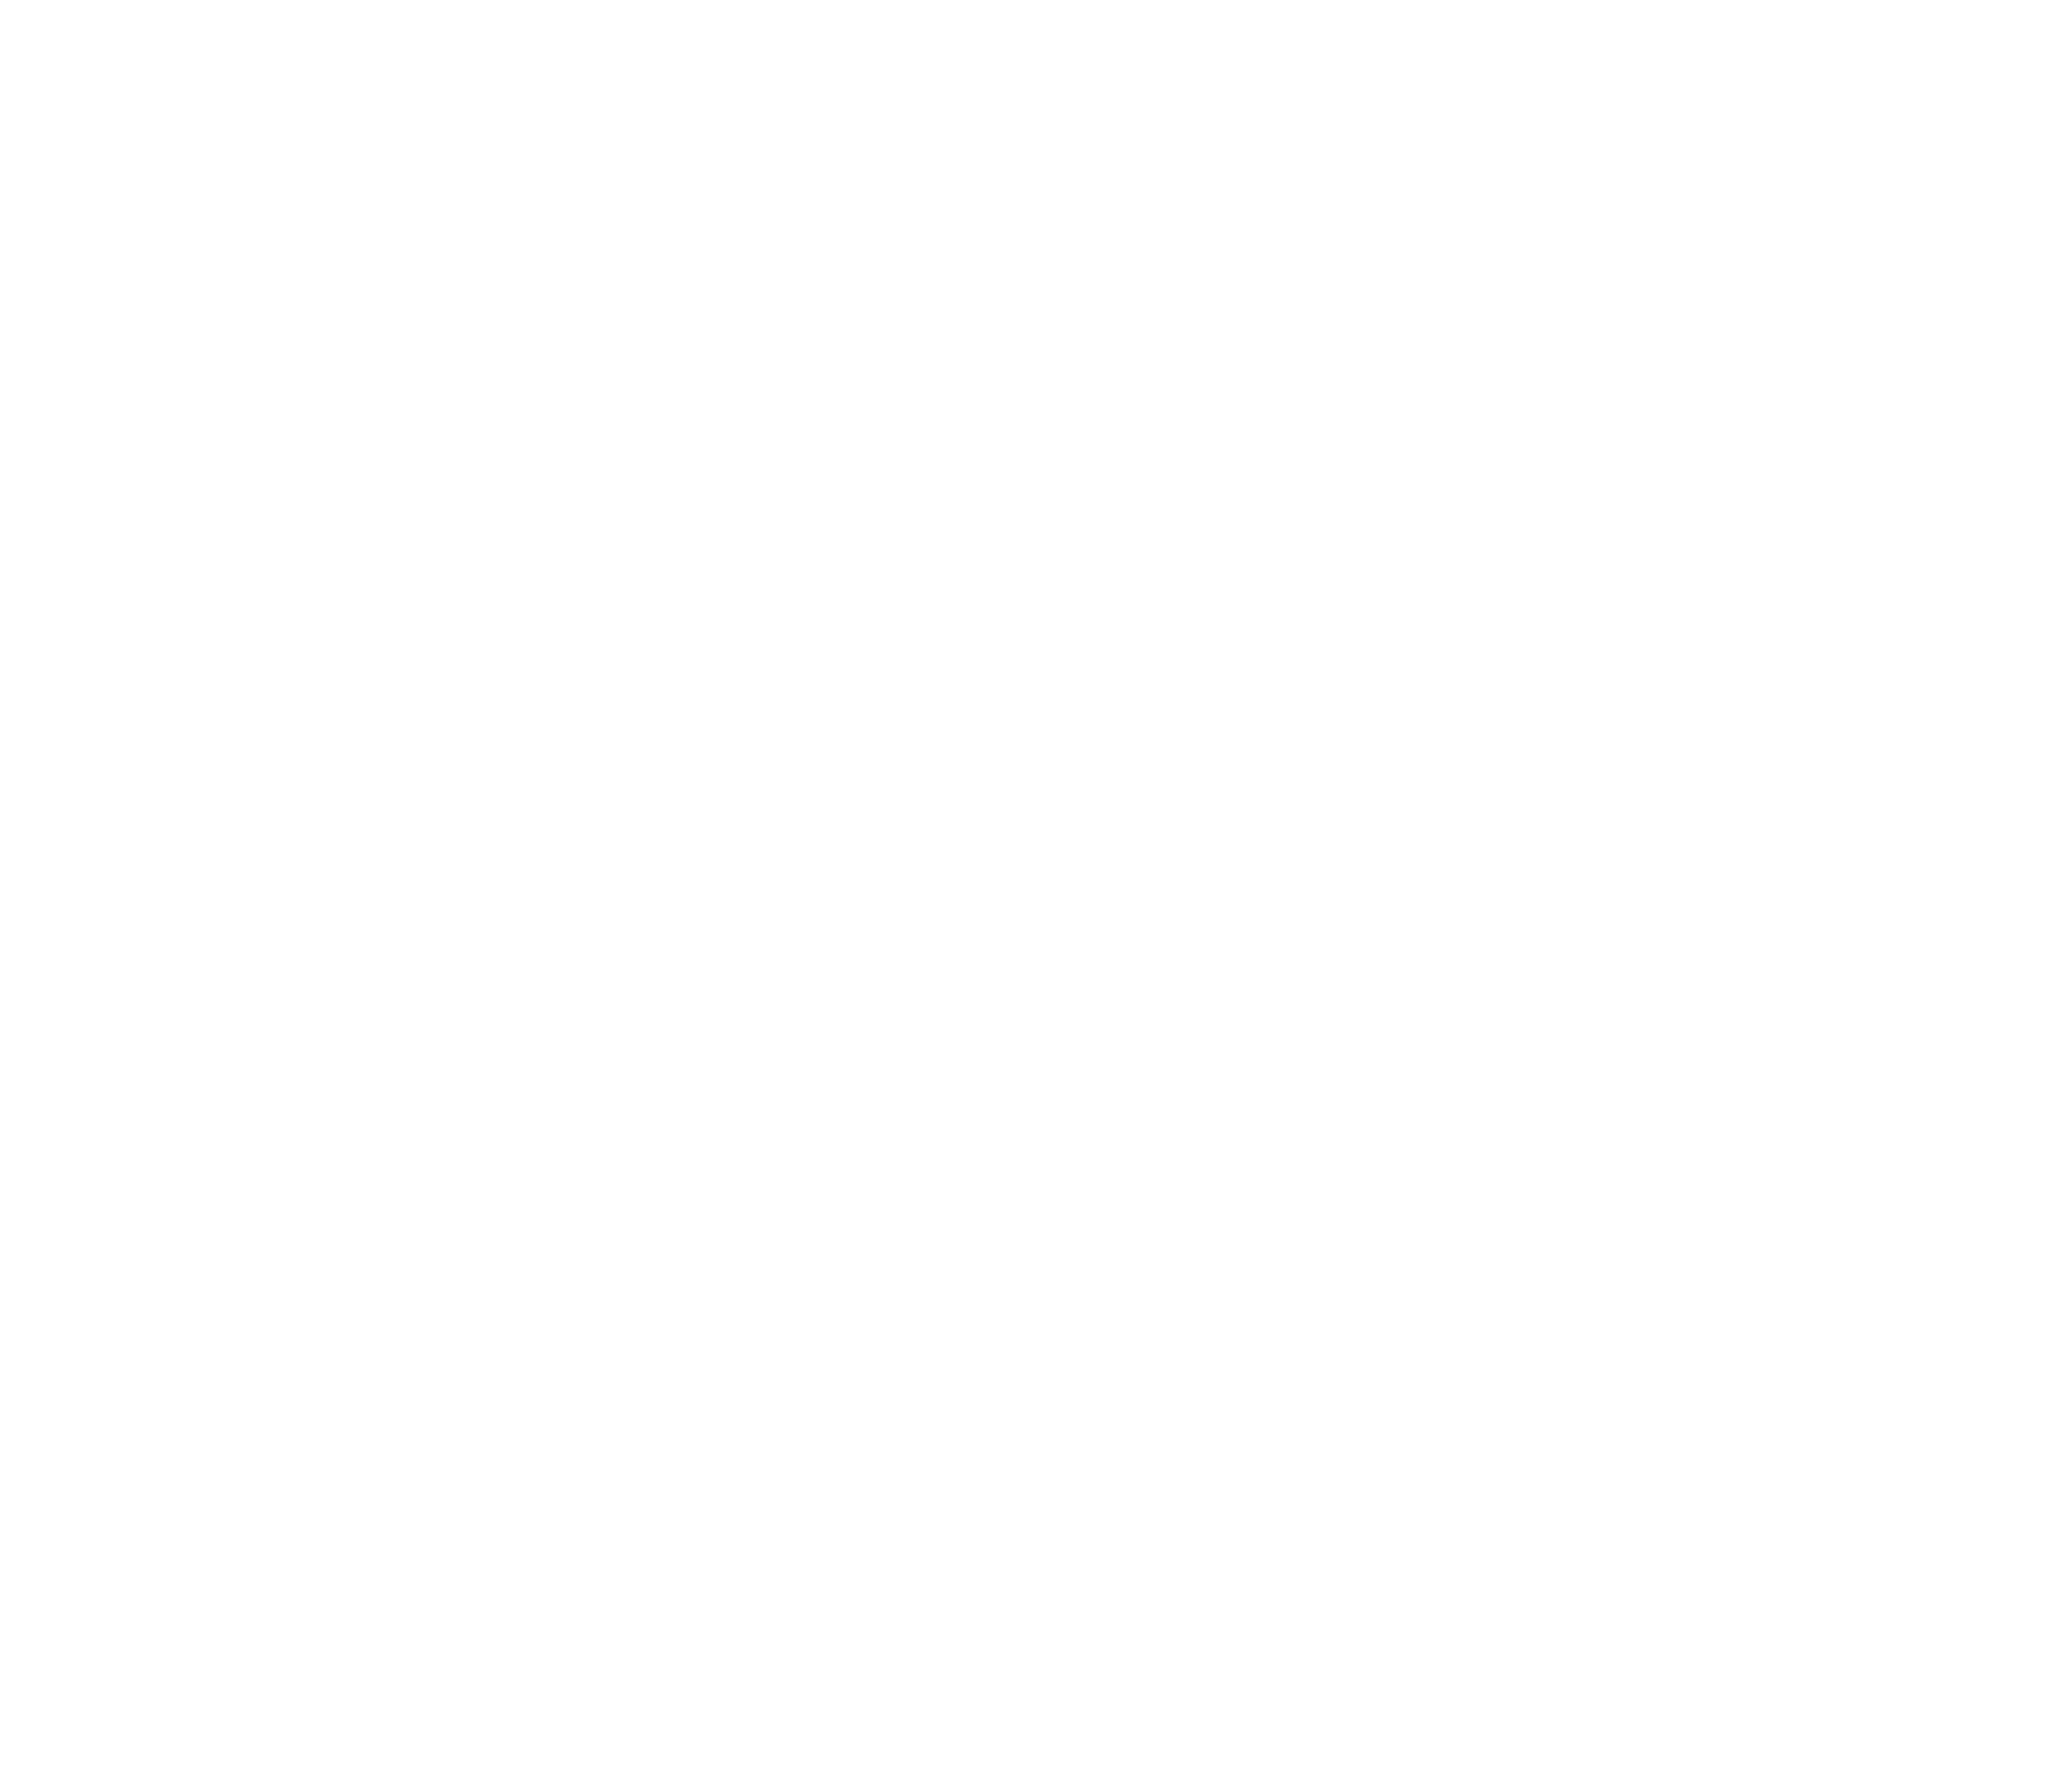 Pirates clipart sign. Pirate transparent png clip